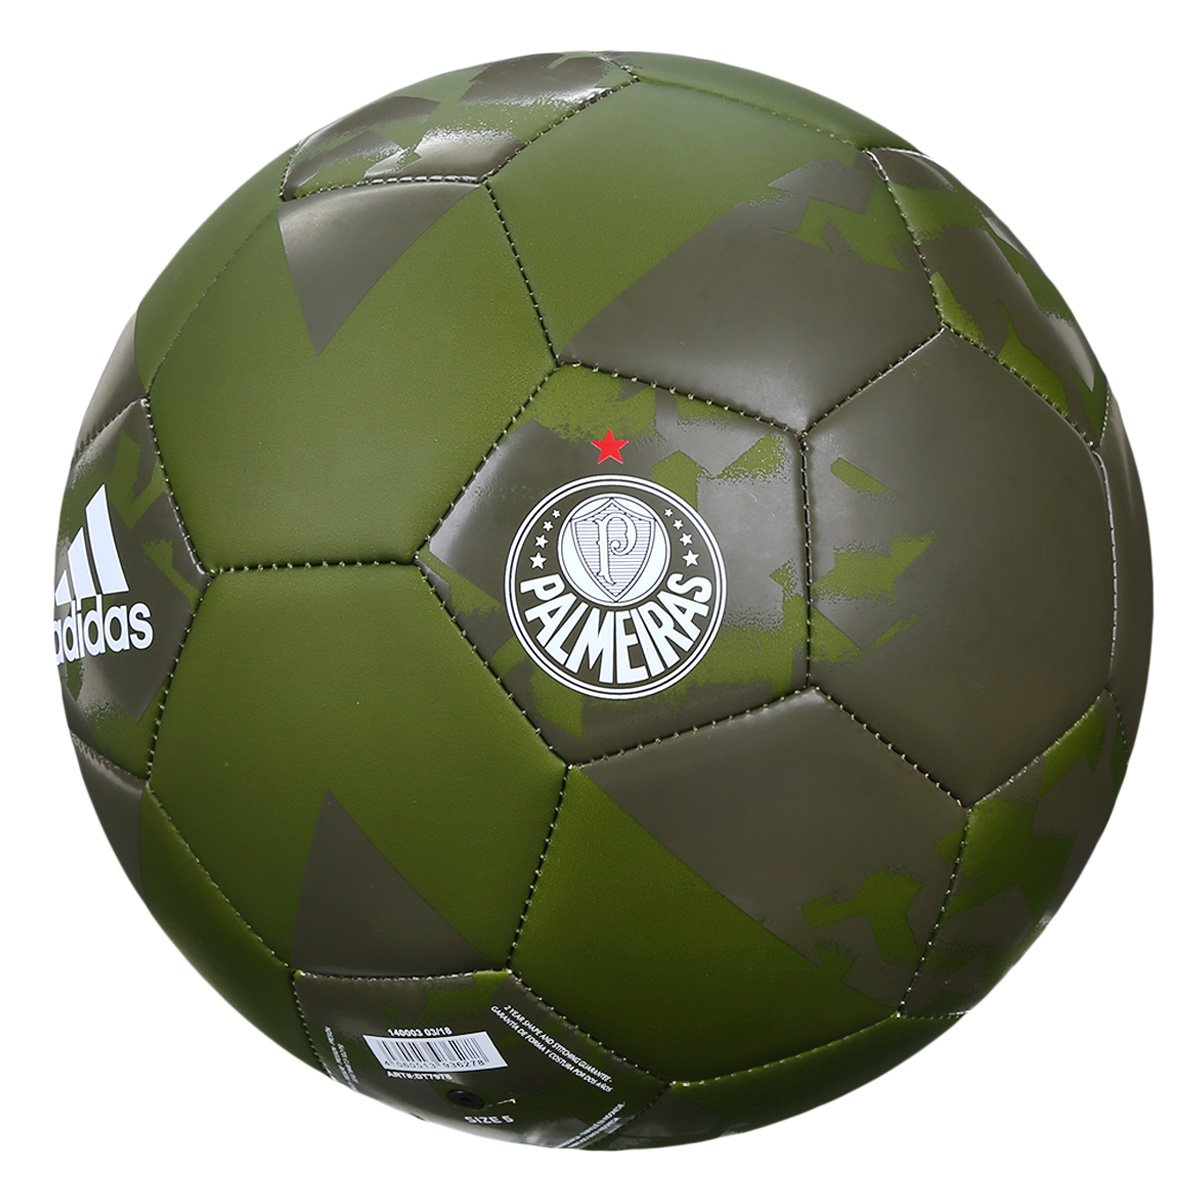 Bola de Futebol Campo Palmeiras Adidas X - Compre Agora  1acac2ea6602f